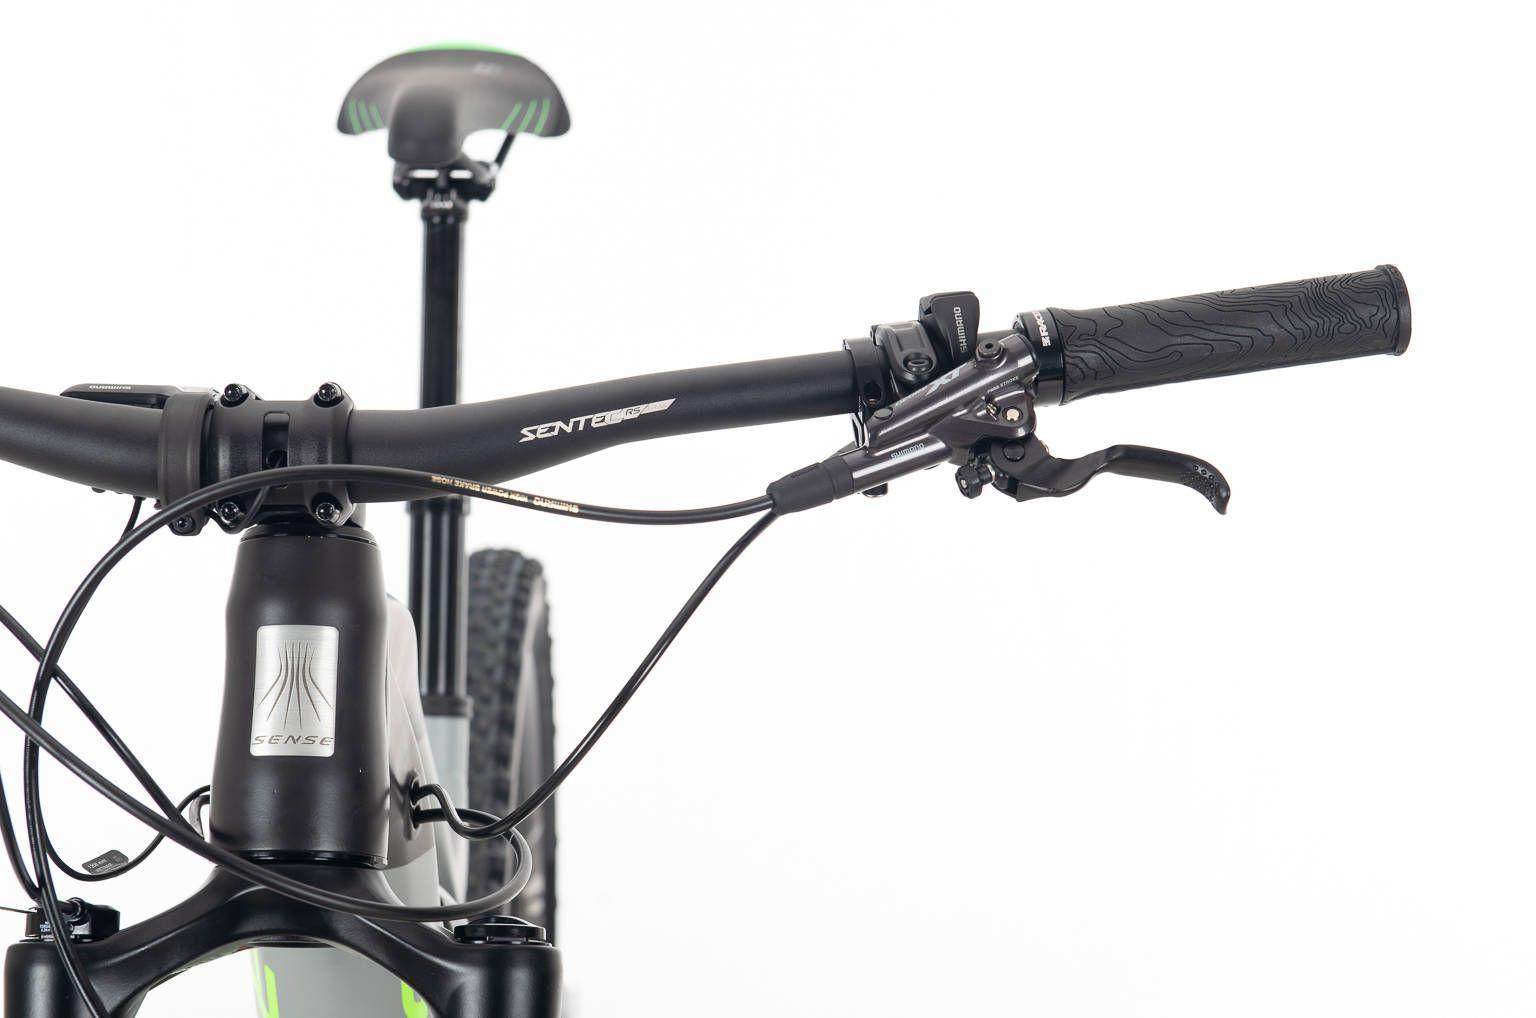 Bicicleta SENSE Impulse E-Trail 2020 - 12v Shimano XT -  Verde Neon/Chumbo